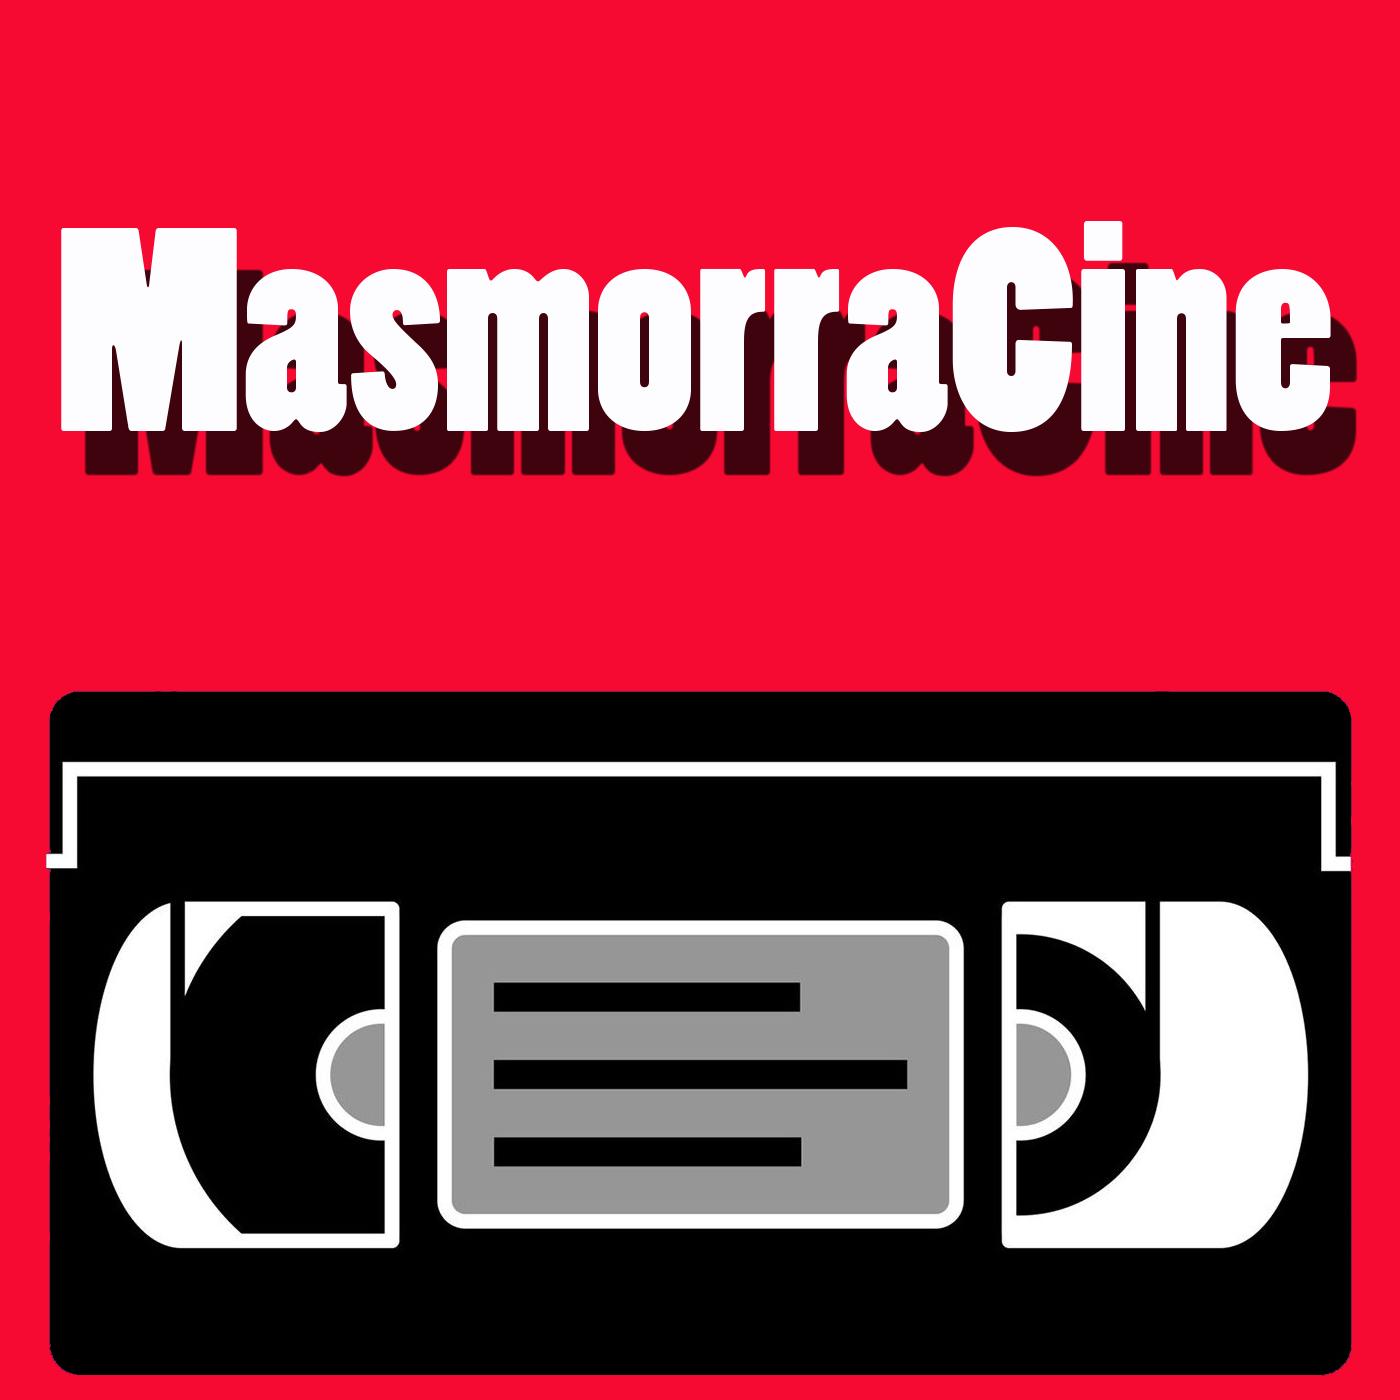 Logotipo masmorracine